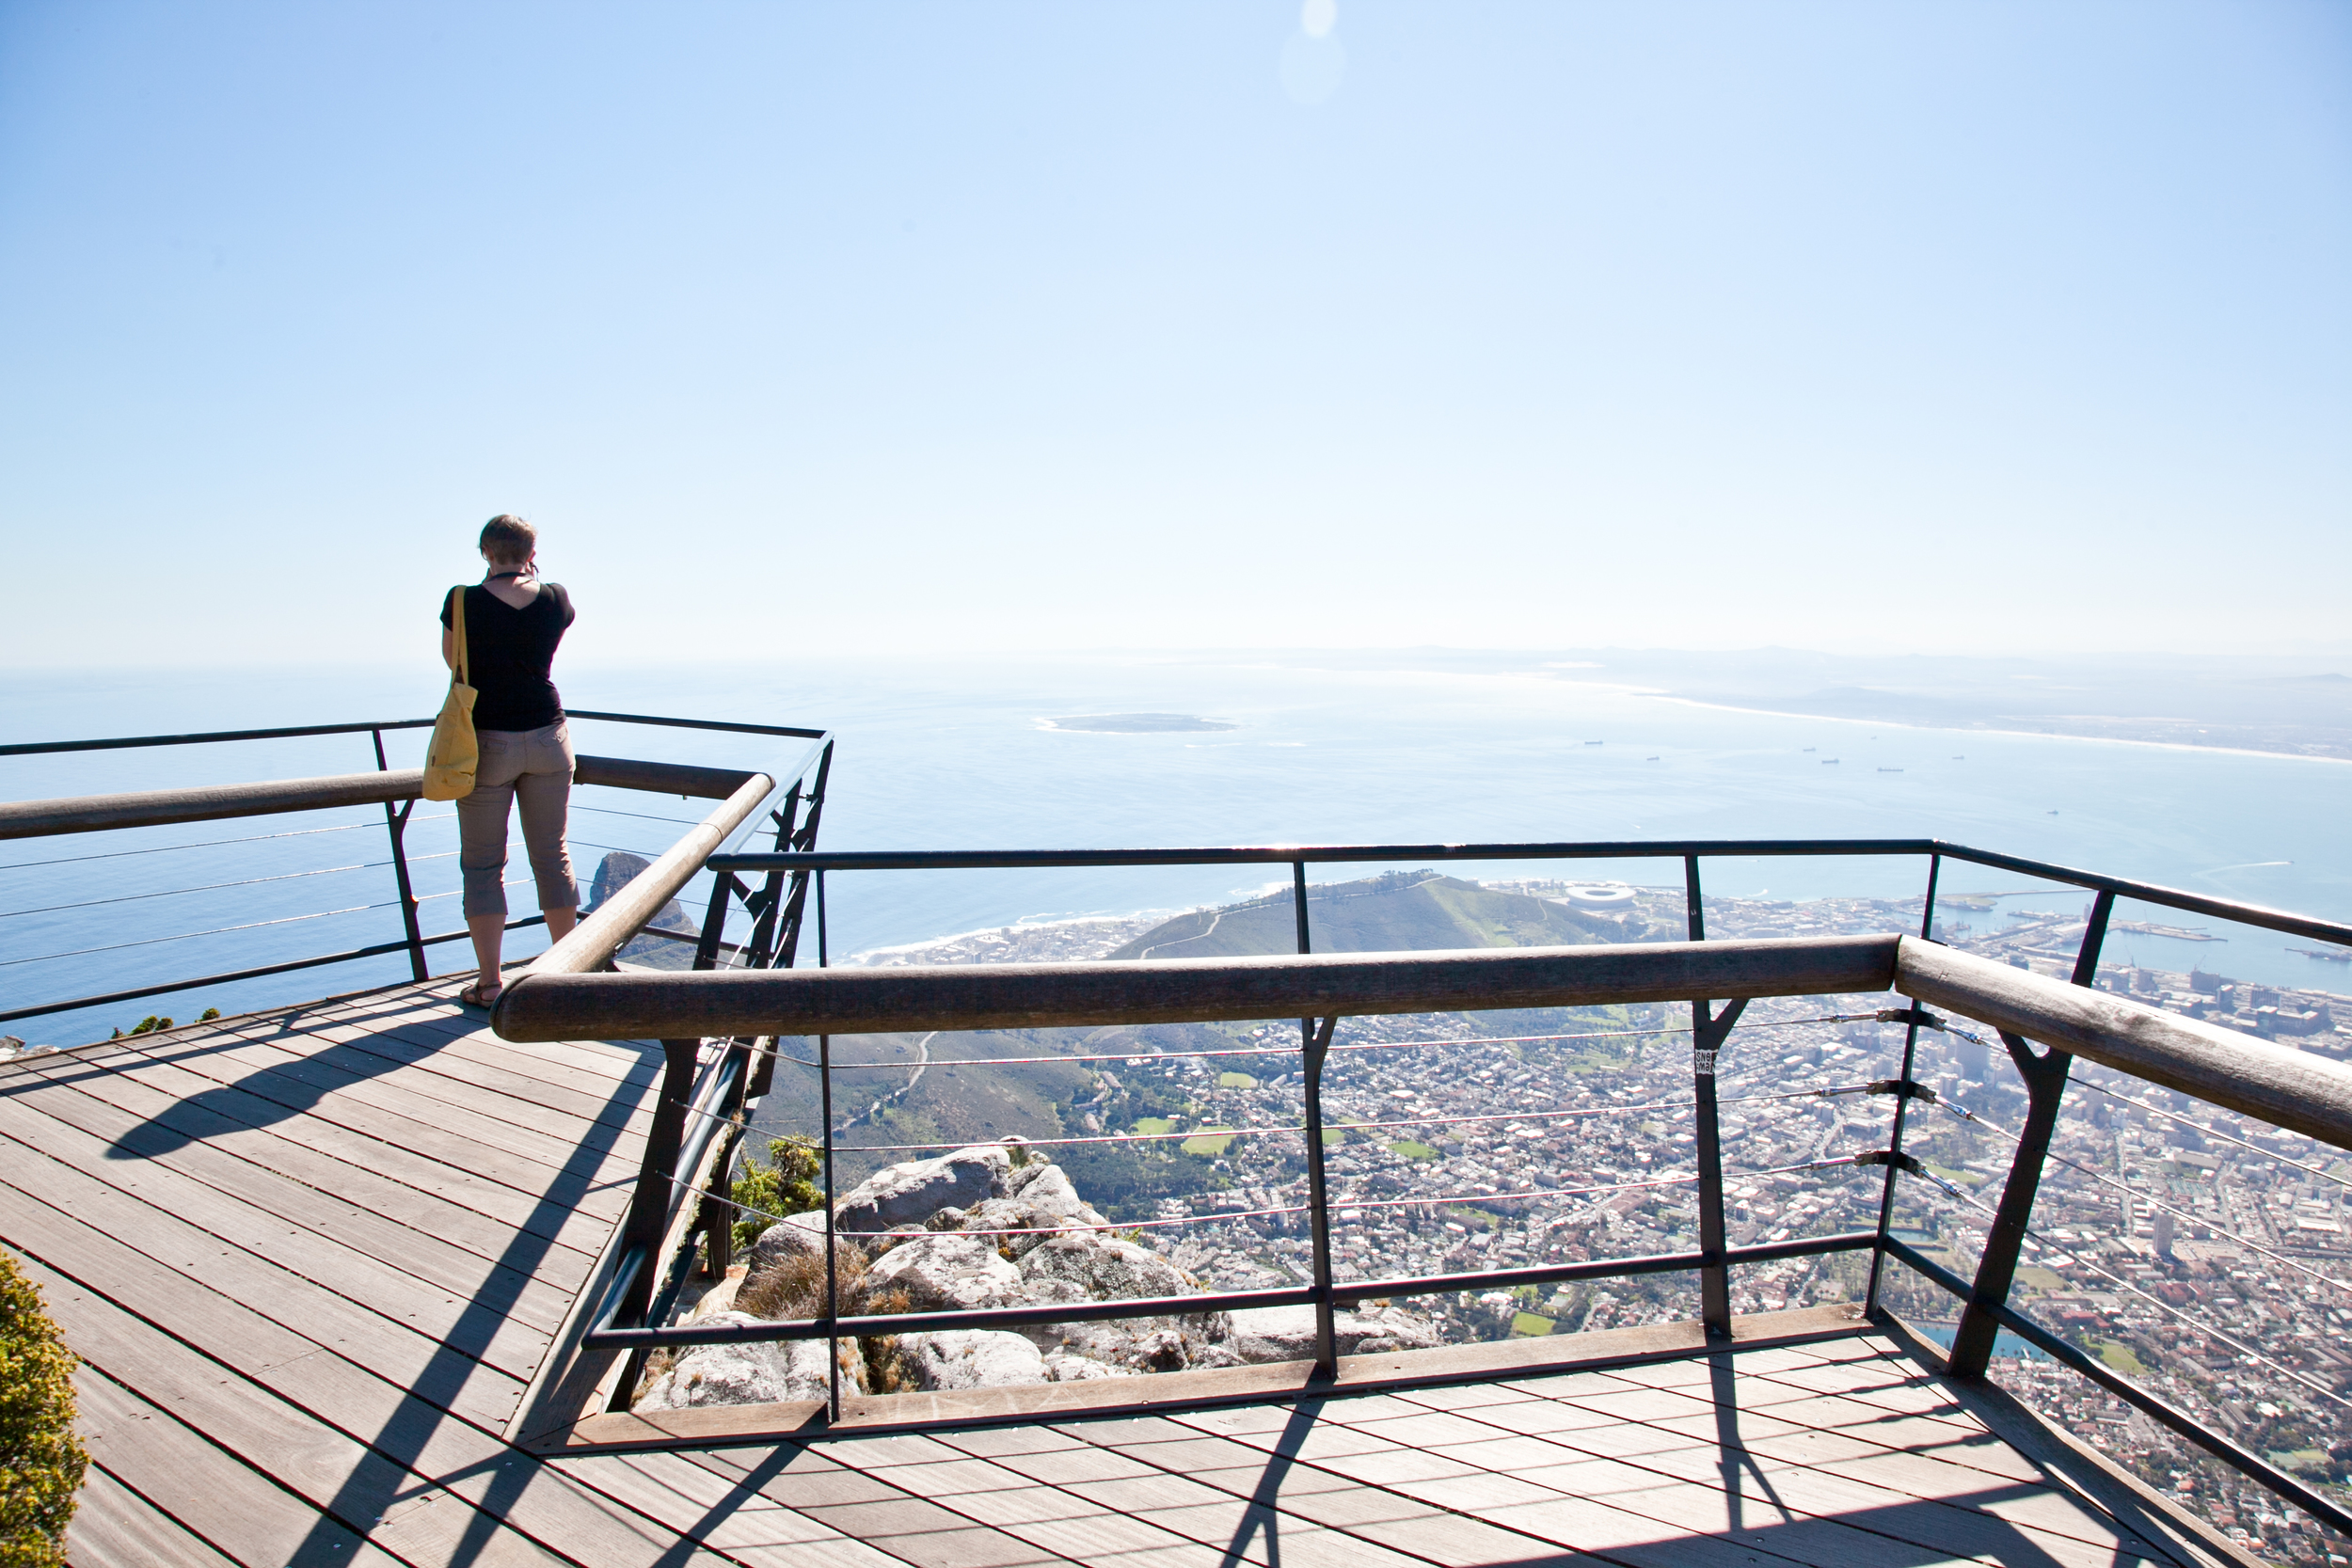 IMG_4700-table-mountain-cape-town-south-africa-trisa-taro.jpg